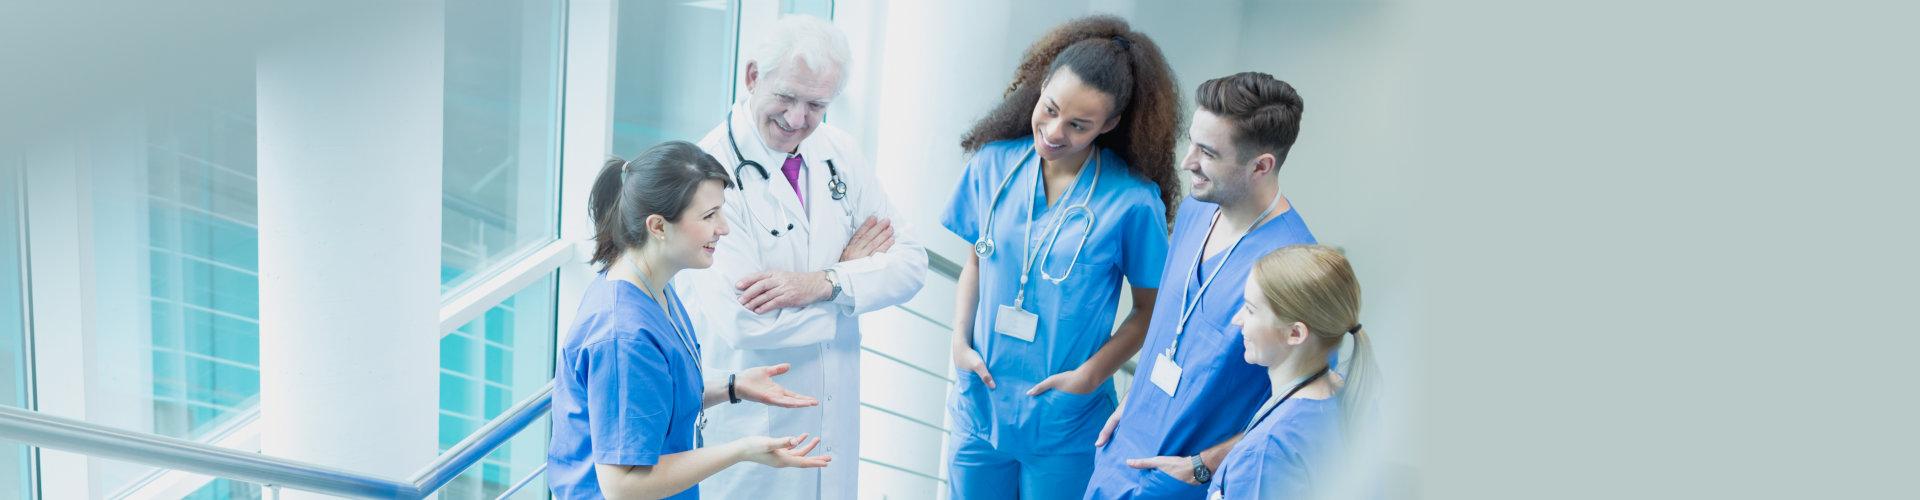 healthcare staff talking